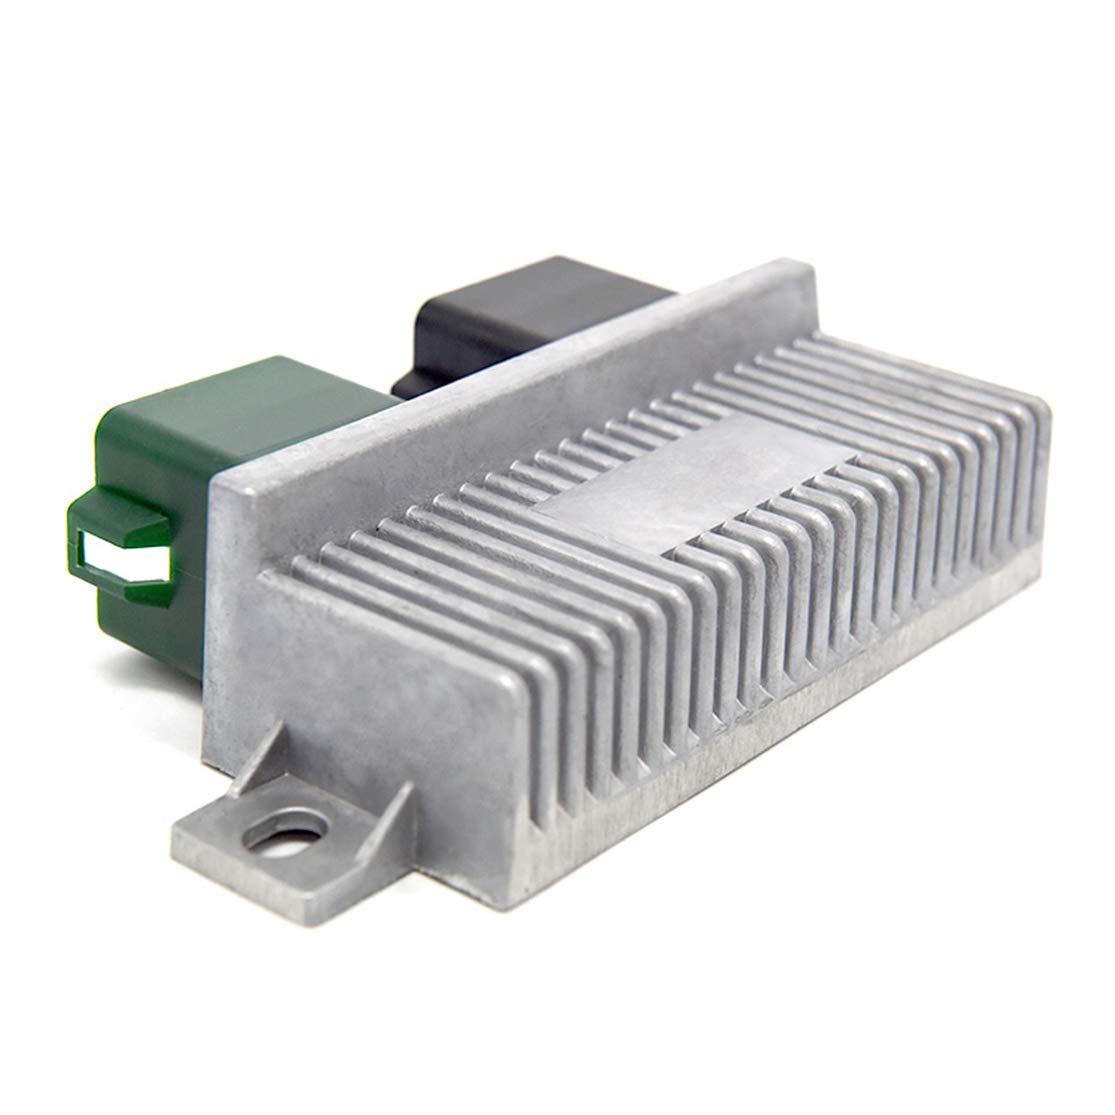 F-350 Diesel Glow Plug Control Relay Module Switch YC3Z12B533AA Compatible with Ford F-250 E-350 Powerstroke 6.0L 6.4L 7.3L Diesel 904-282 DY876 YC3Z-12B533-AA